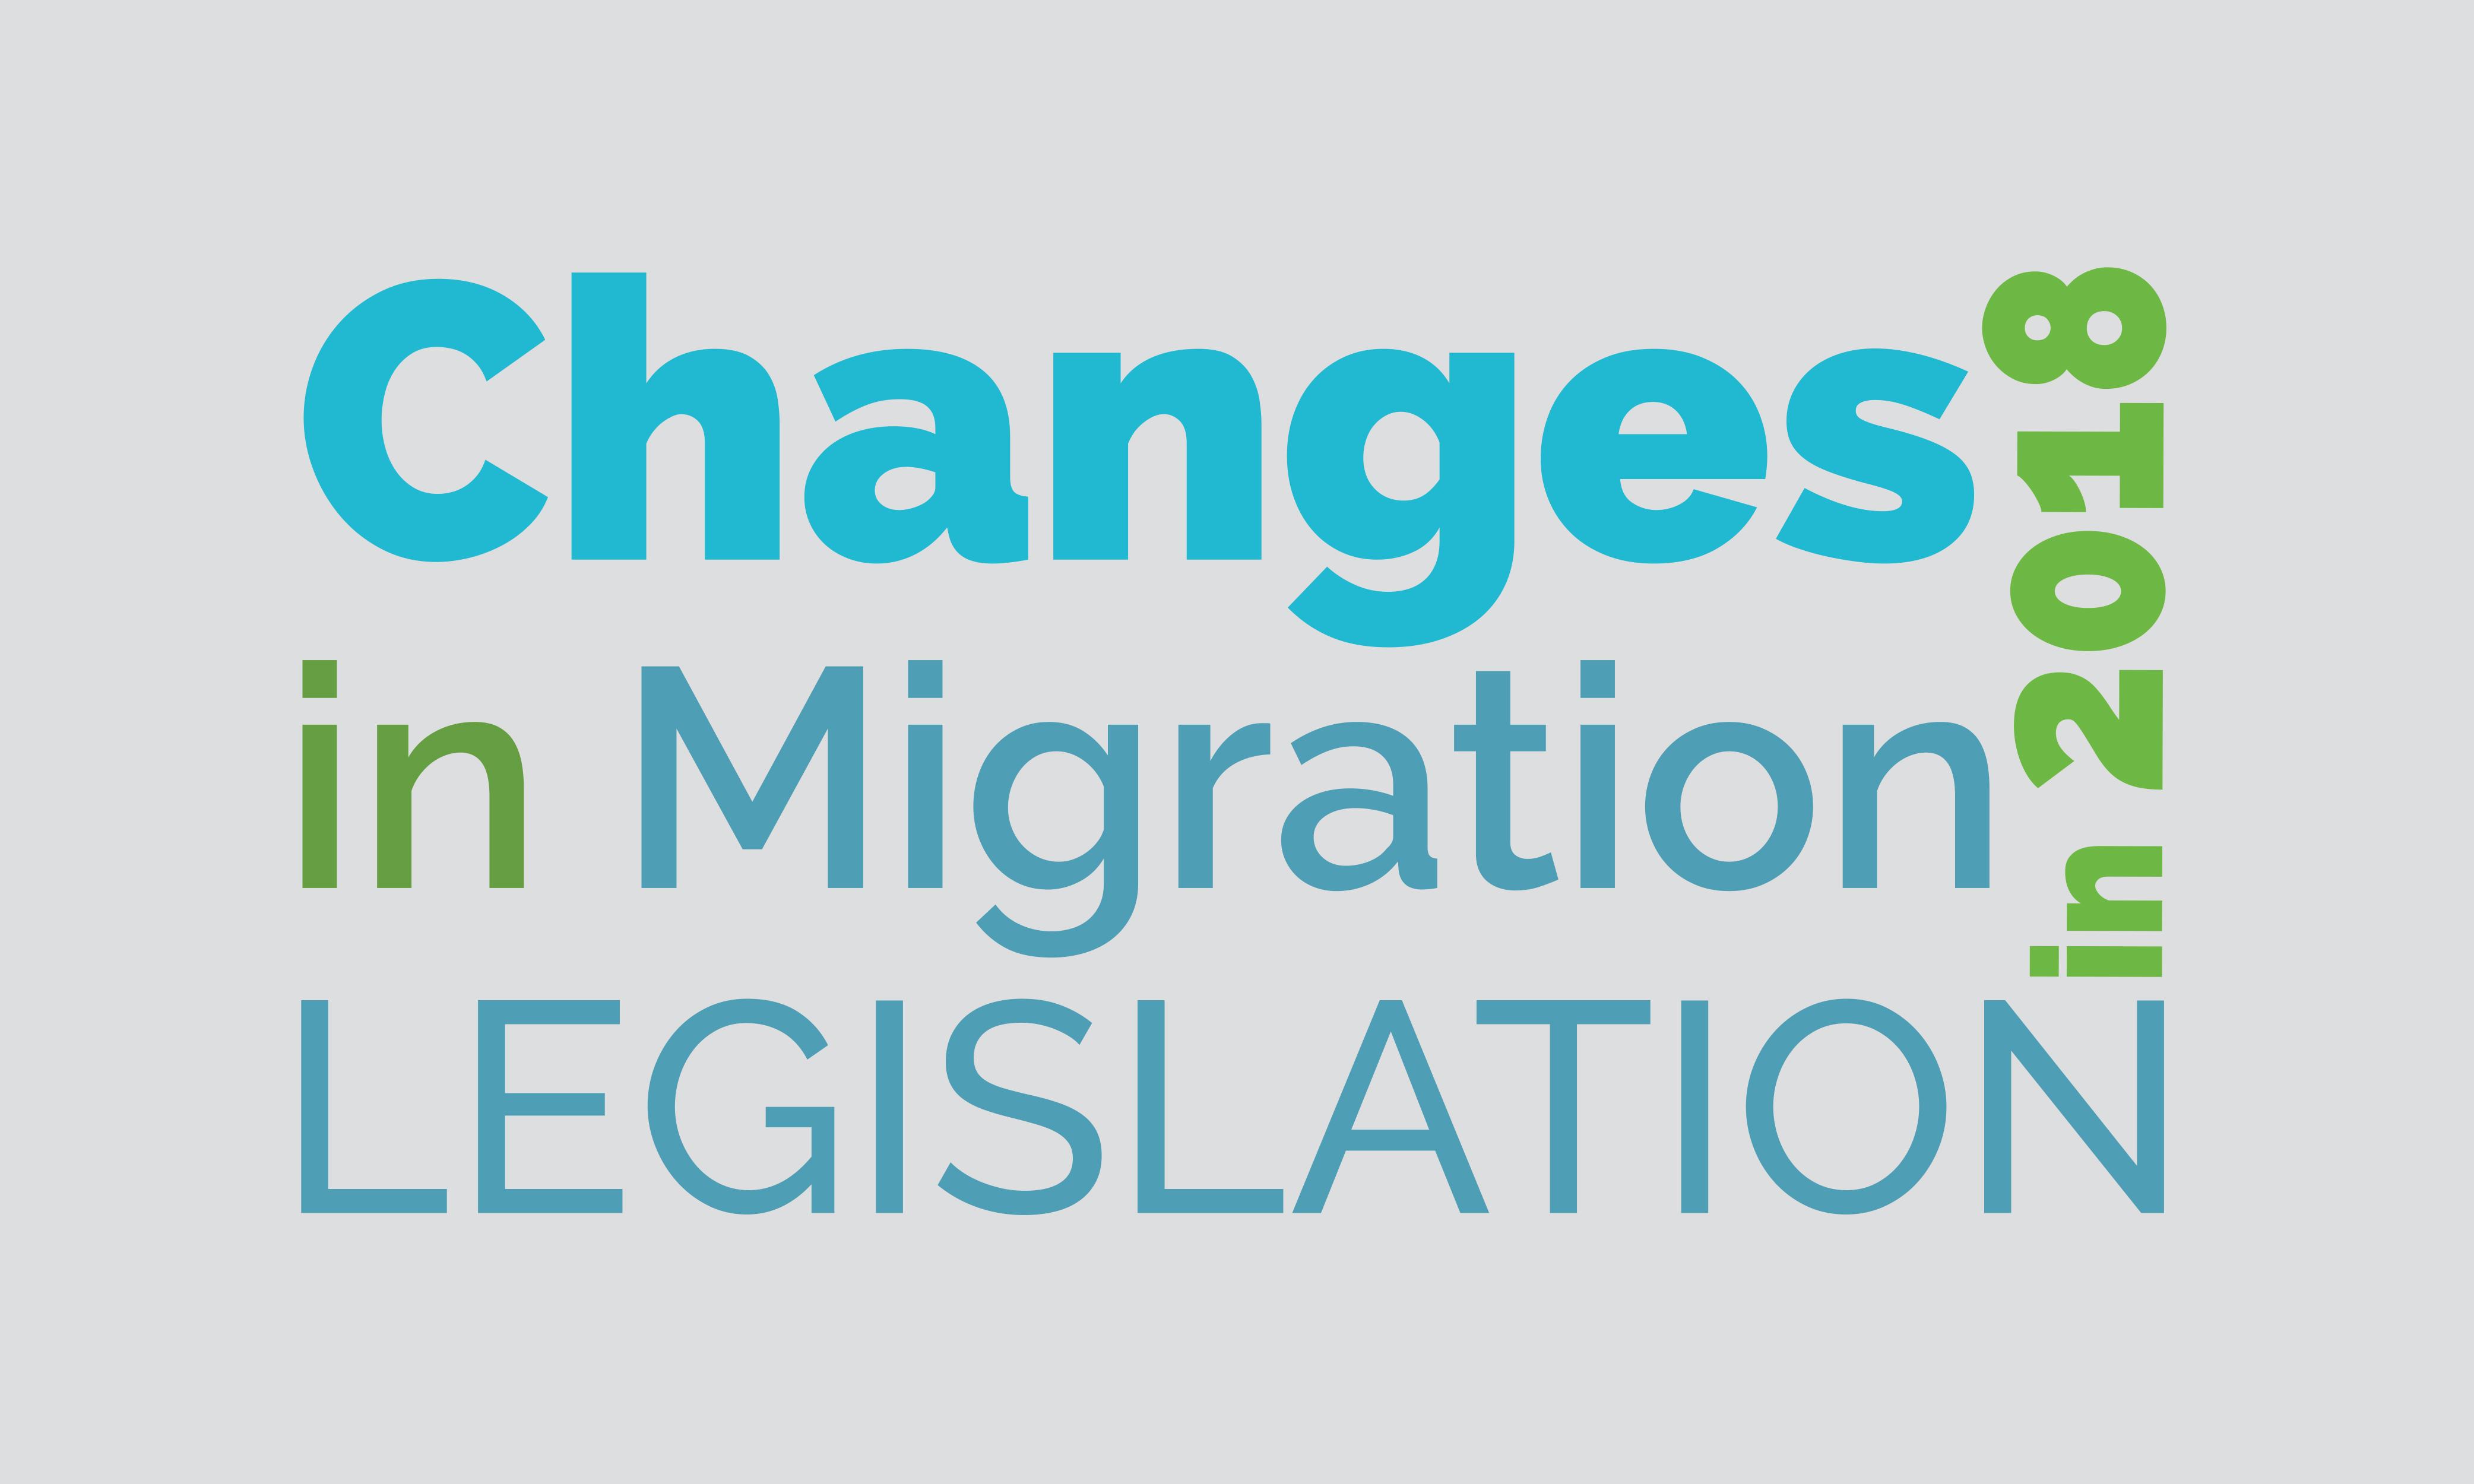 Changes in Migration Legislation in 2018 - Bravo Migration